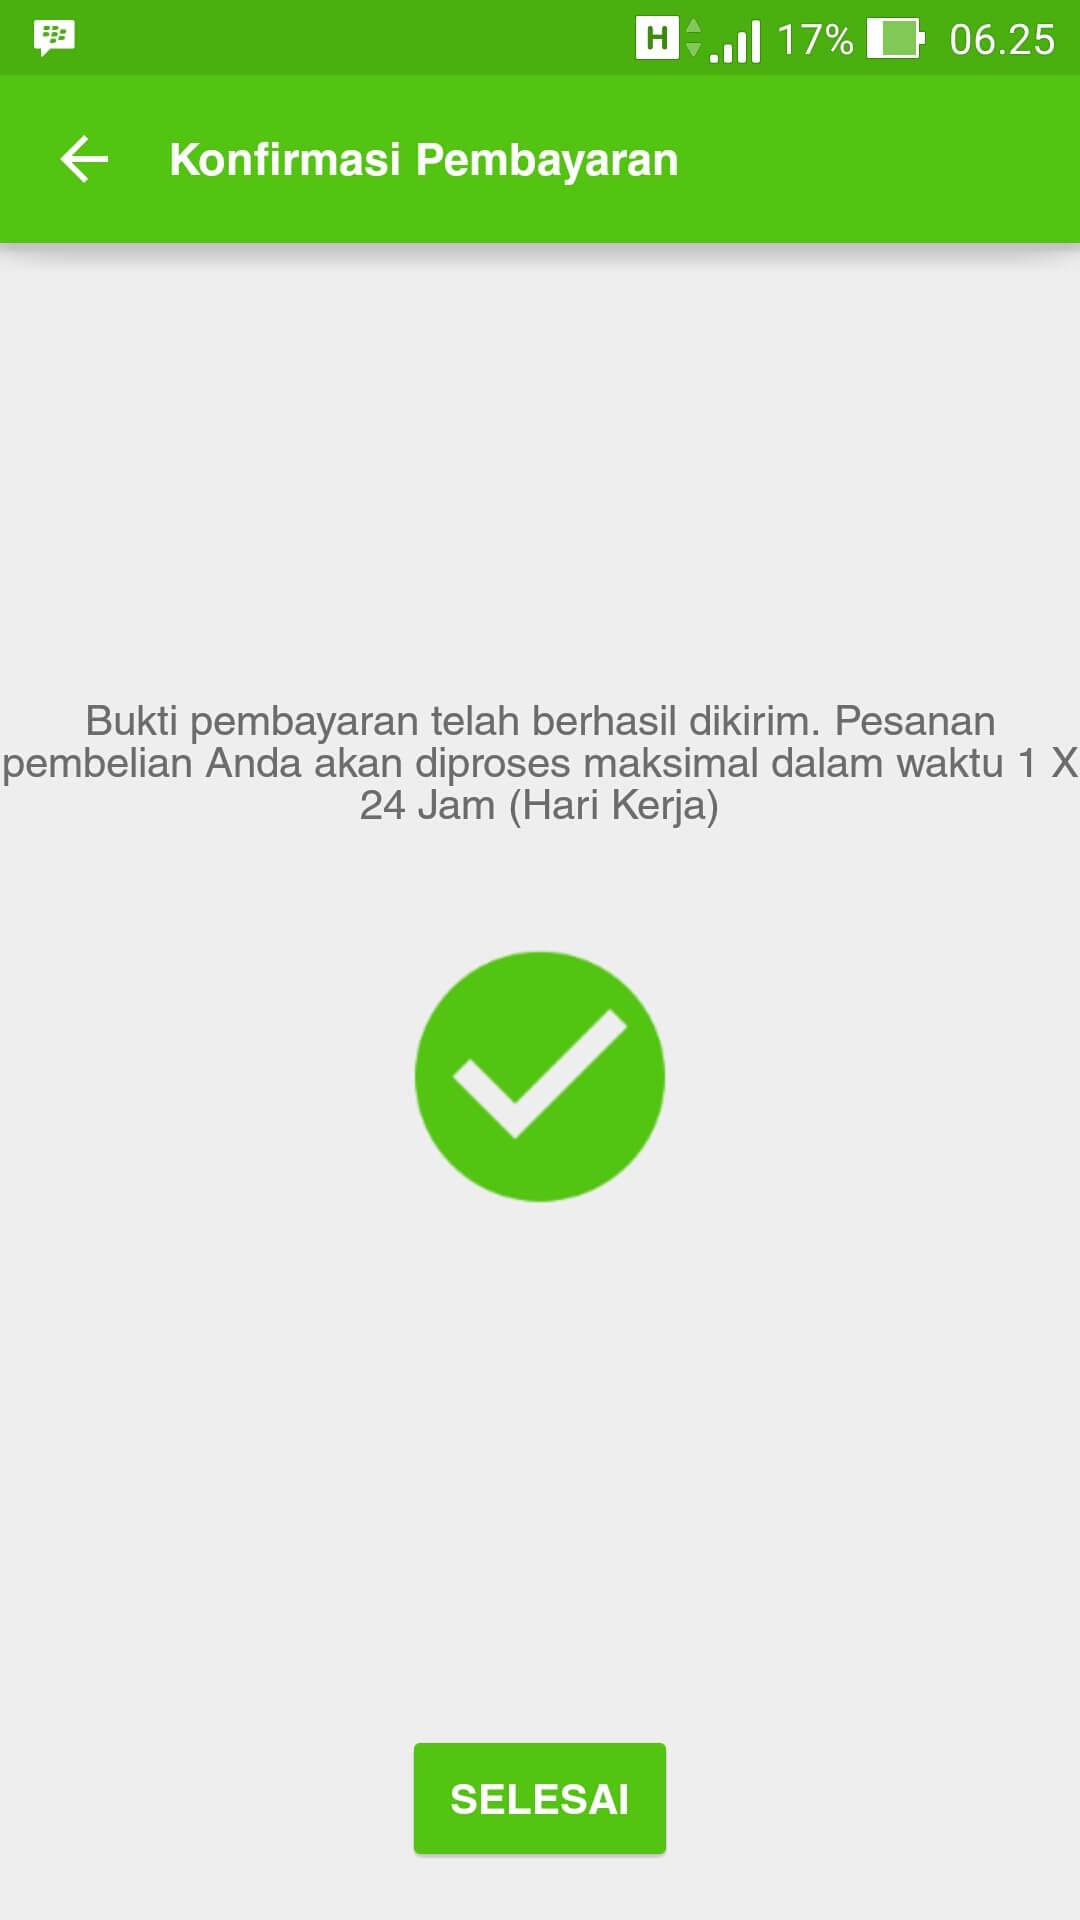 Cara Membeli Reksa Dana Di Bareksa Melalui Website Dan Aplikasi (Update 25/4/18) 20